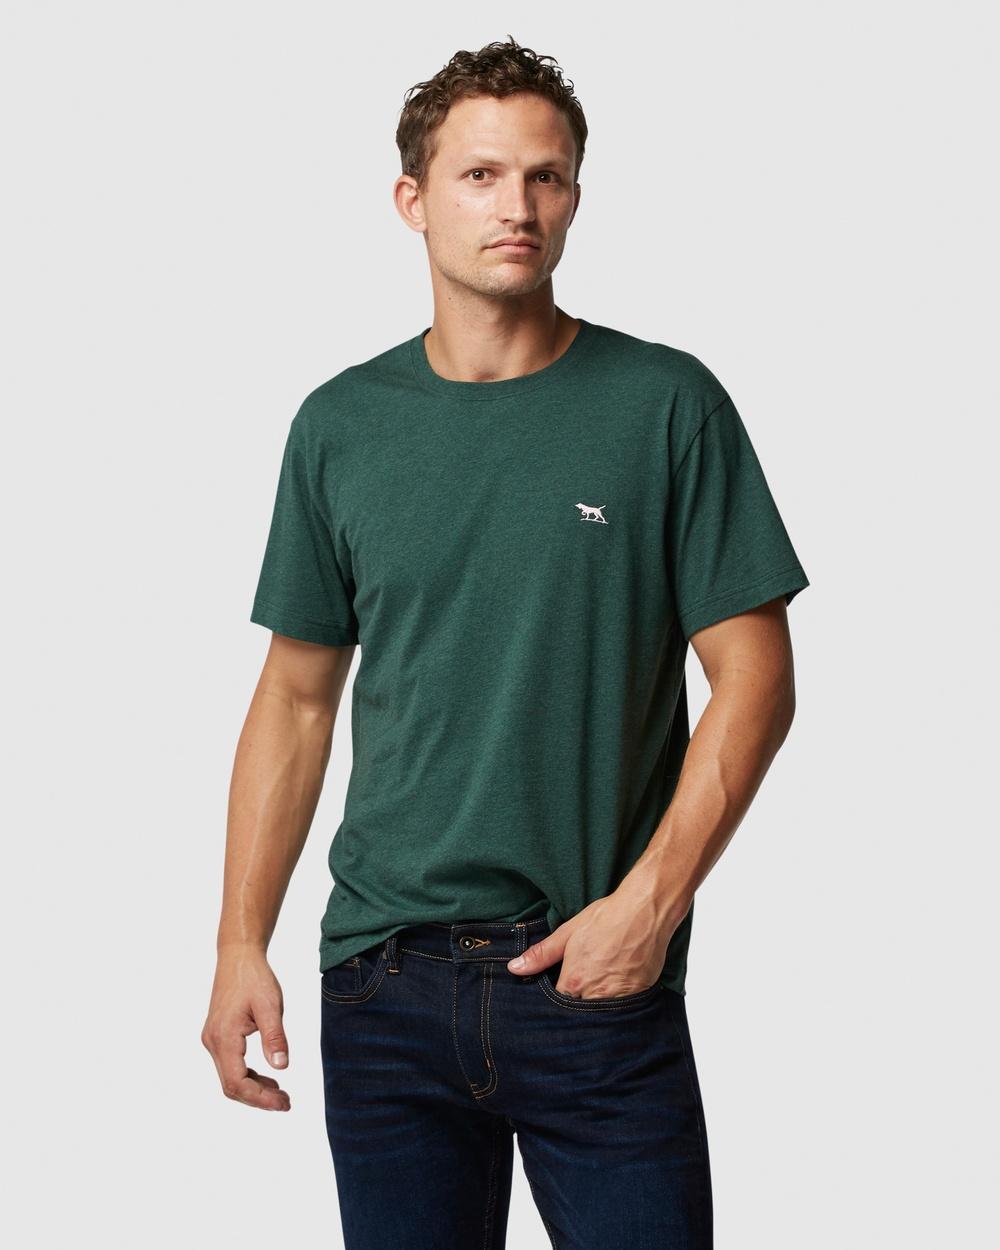 Rodd & Gunn The T Shirt T-Shirts Singlets Pine T-Shirt Australia